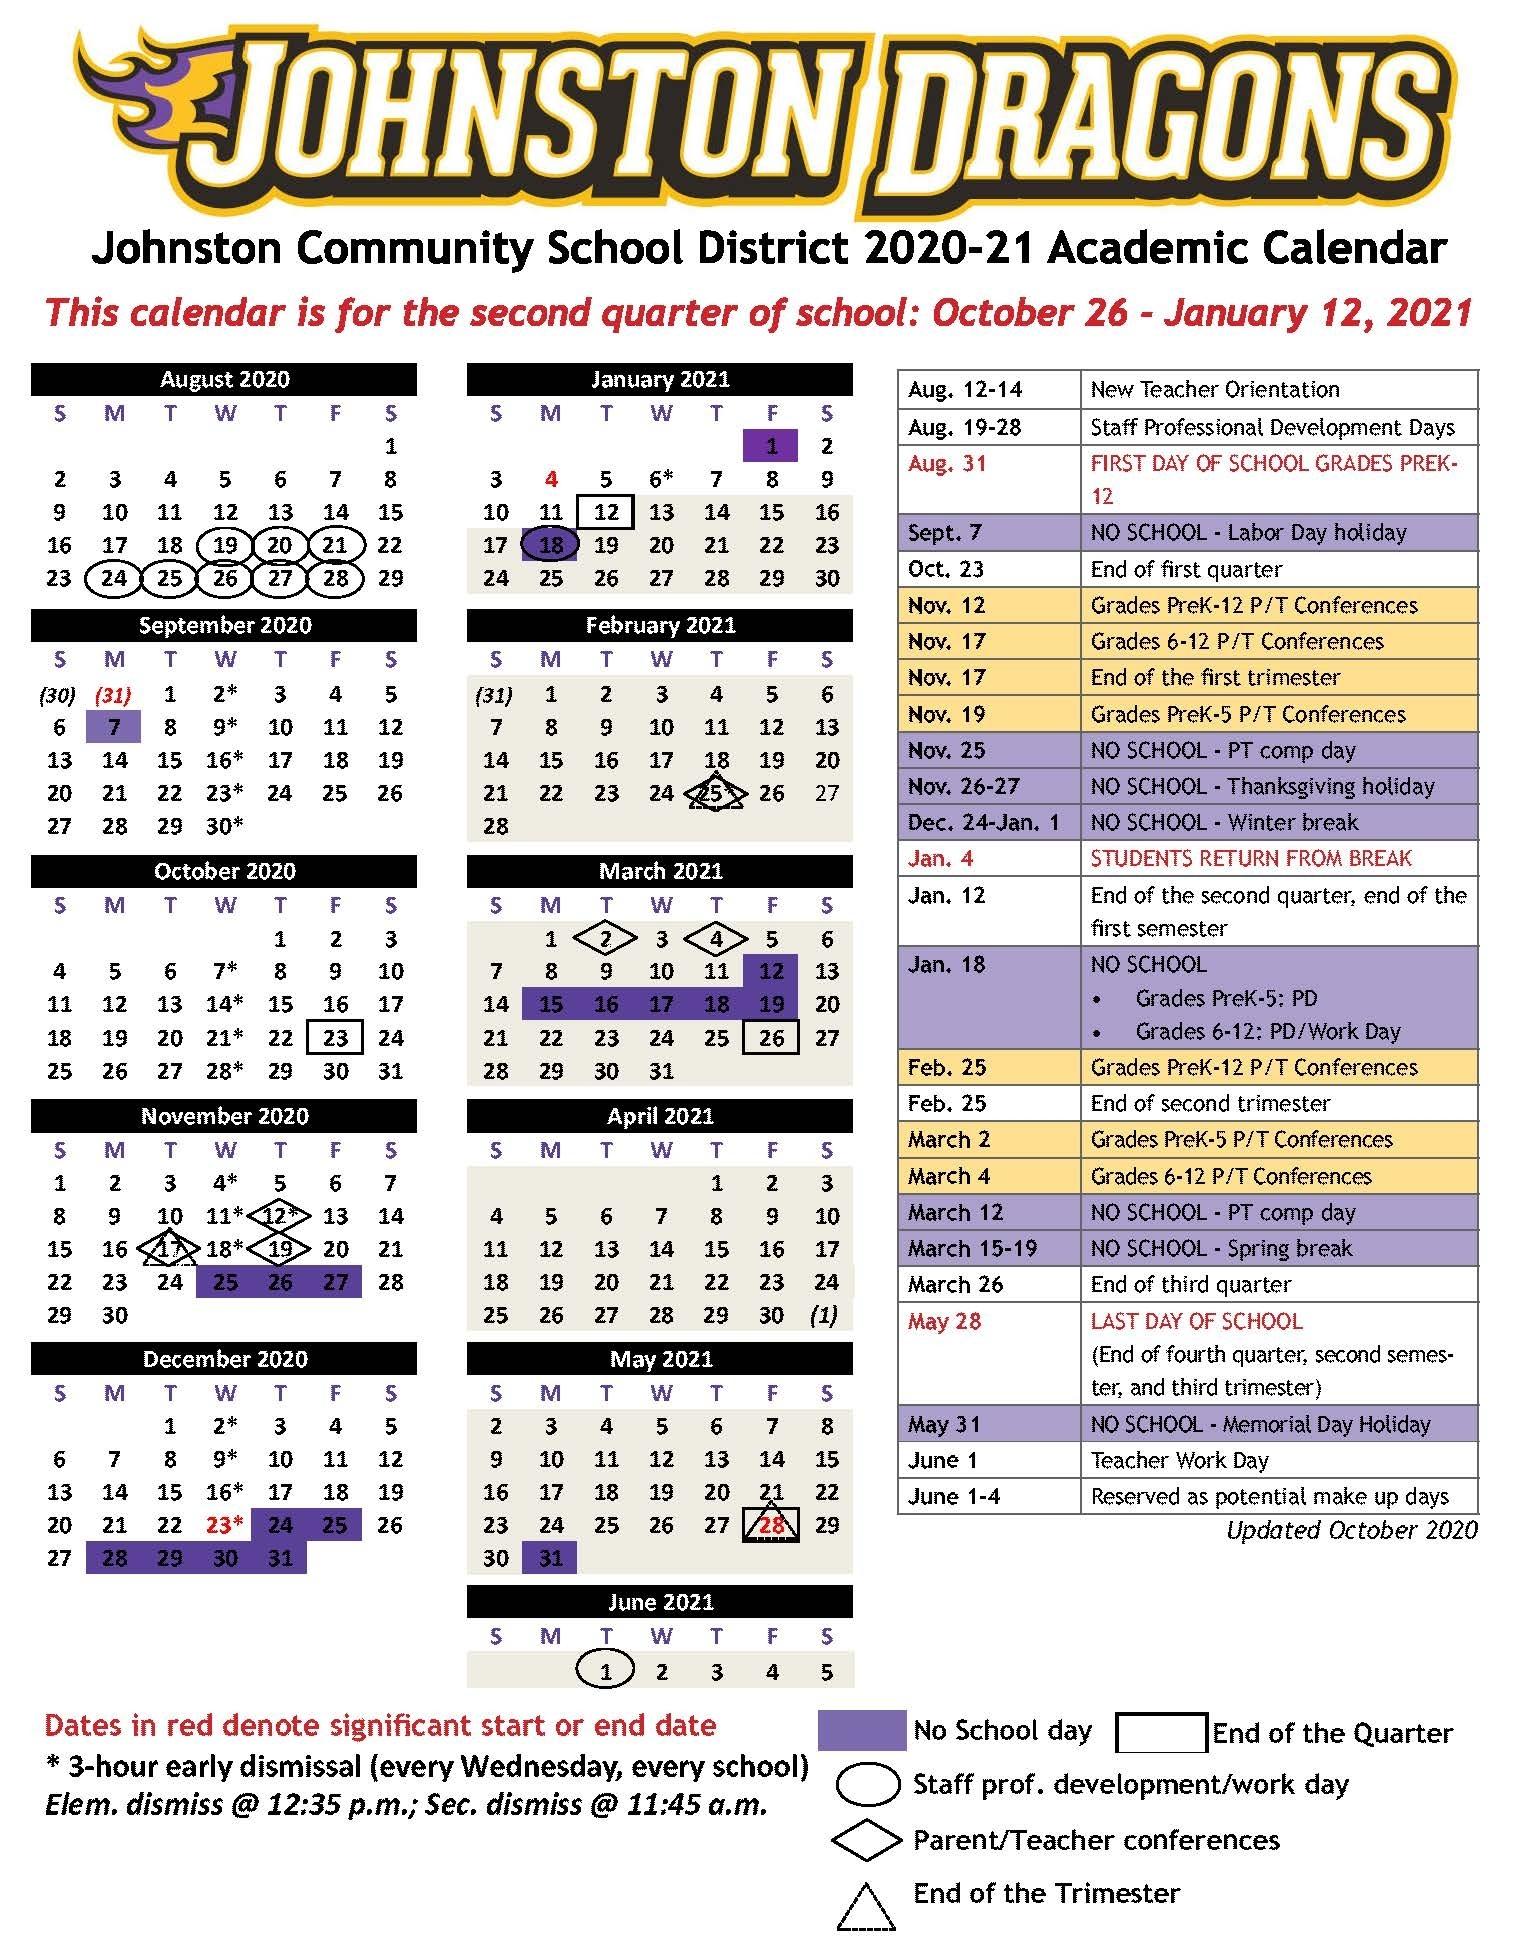 Academic Calendars - Johnston Community School District